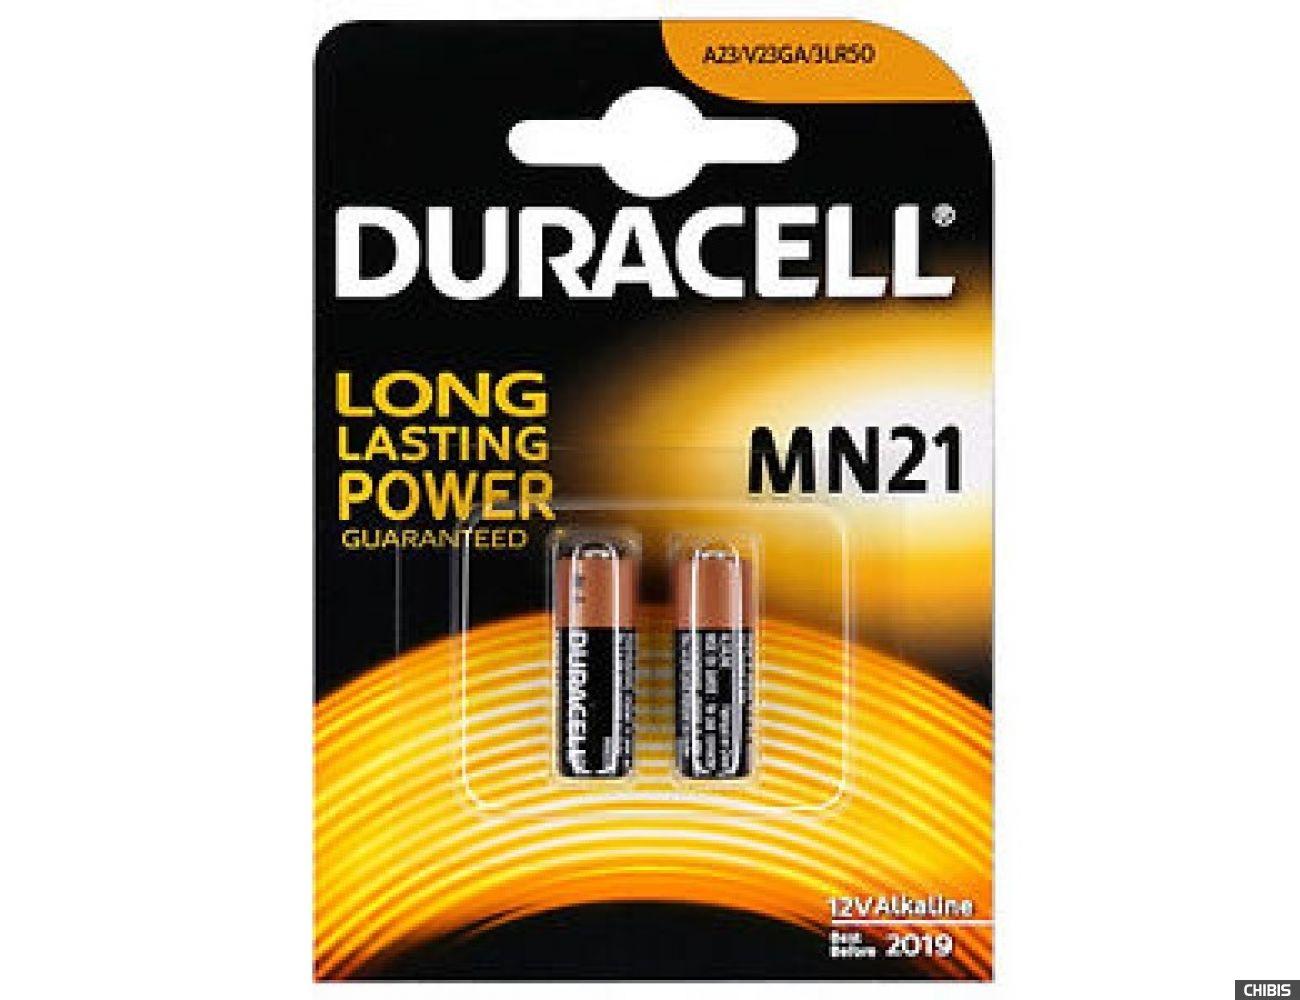 Батарейка Duracell MN21 (LRV08, 12V, Alkaline  Щелочная) 1/2 шт.